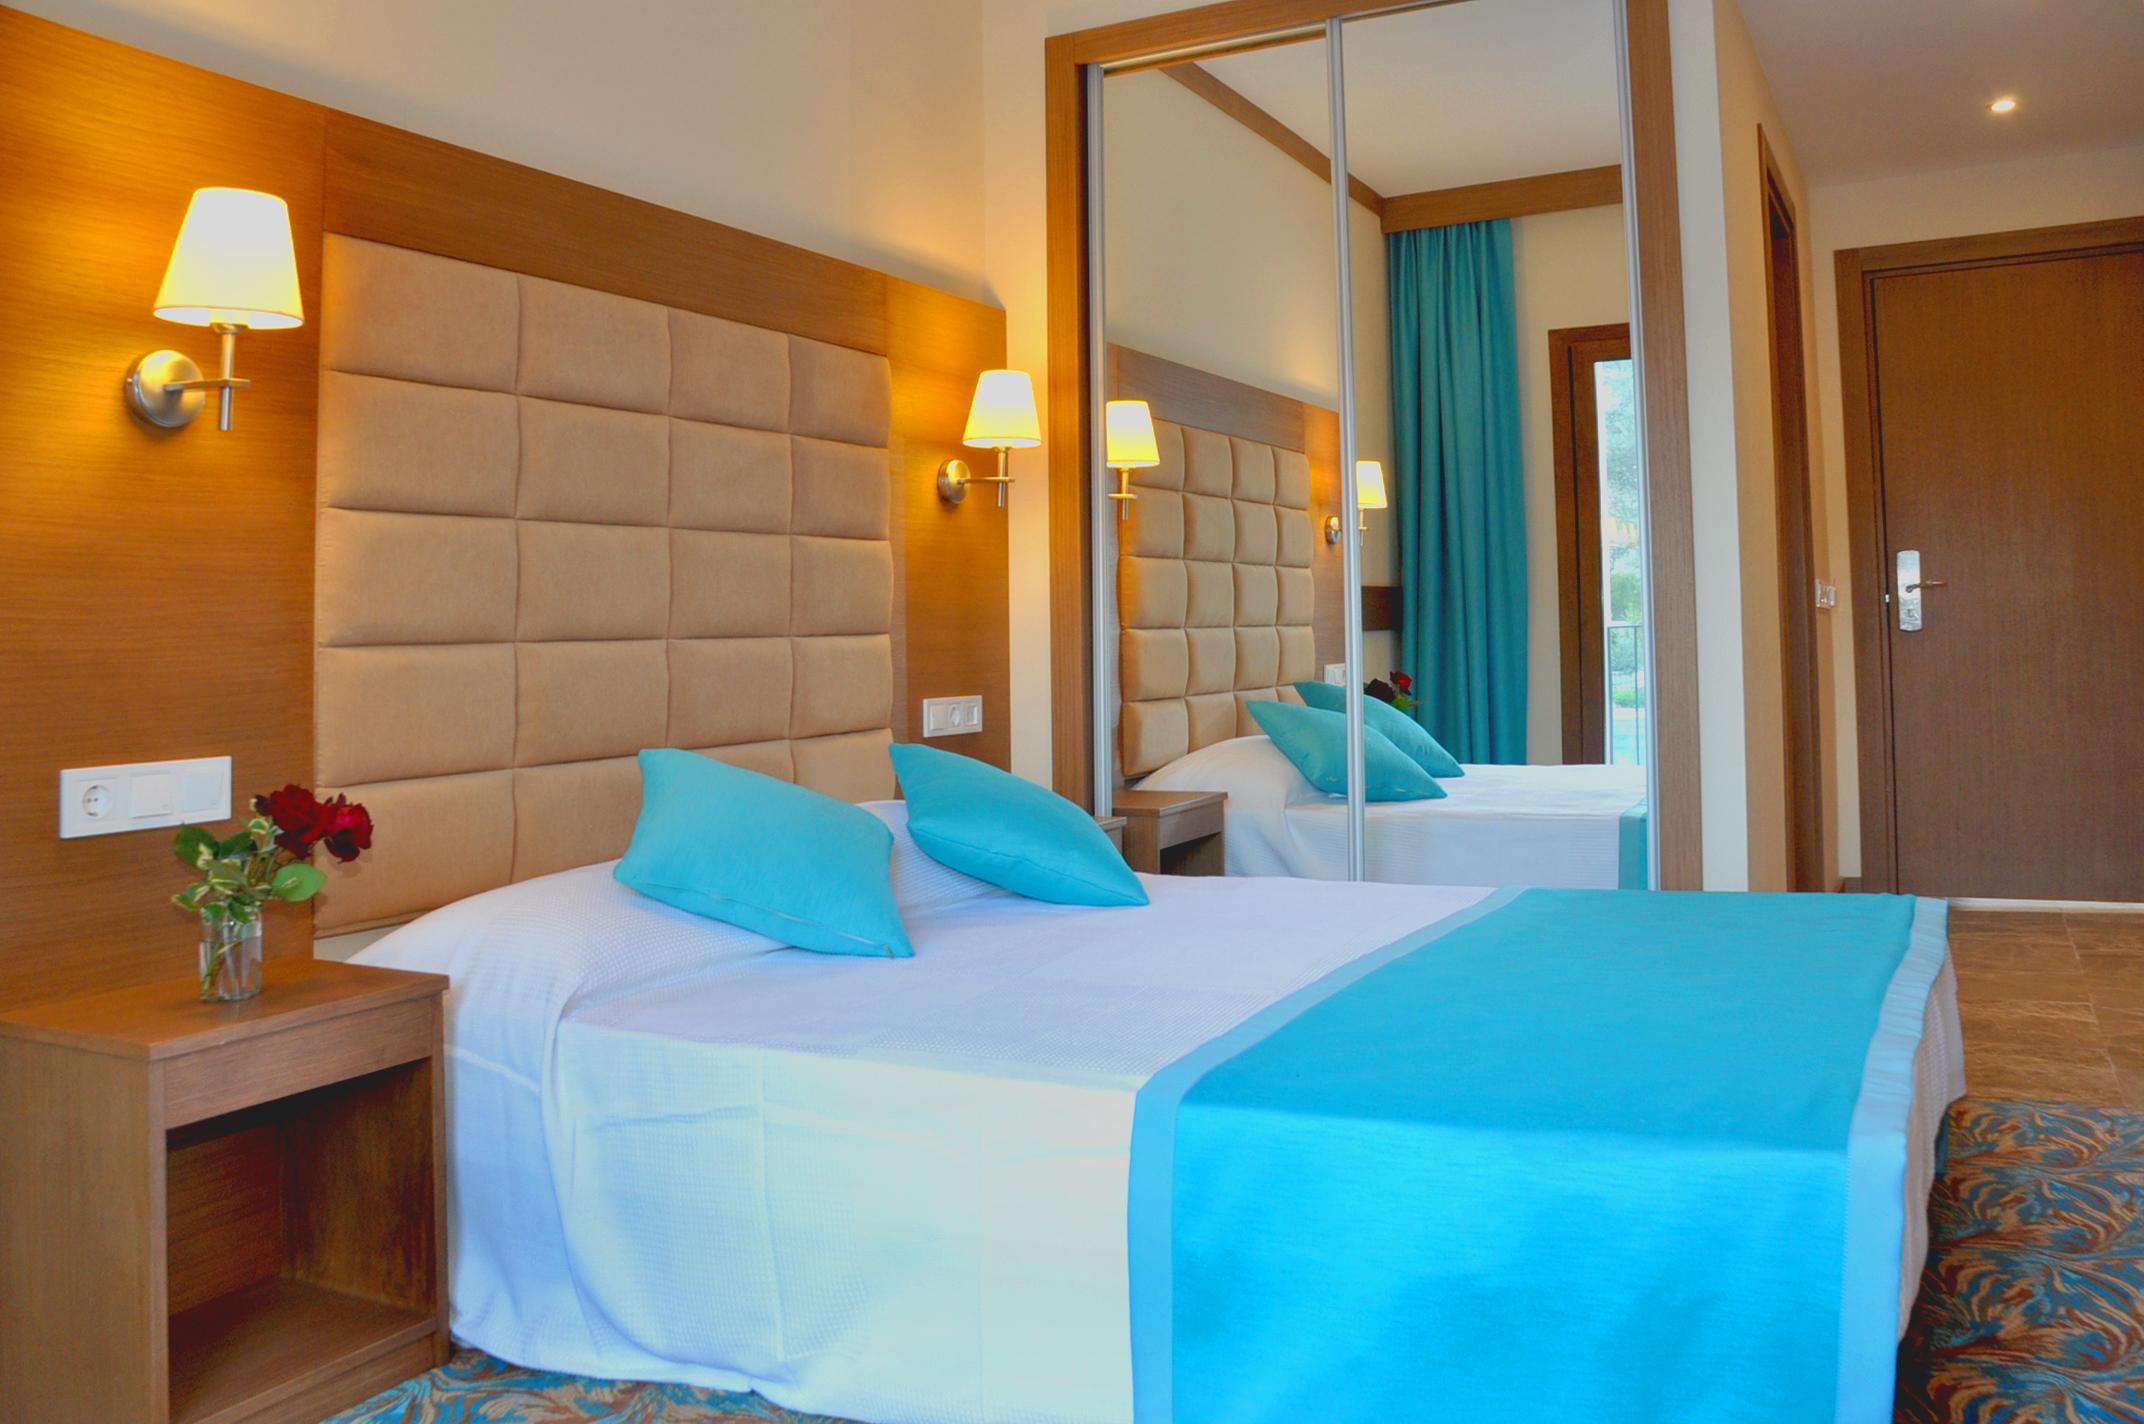 Liona Hotel Gündoğan (13)